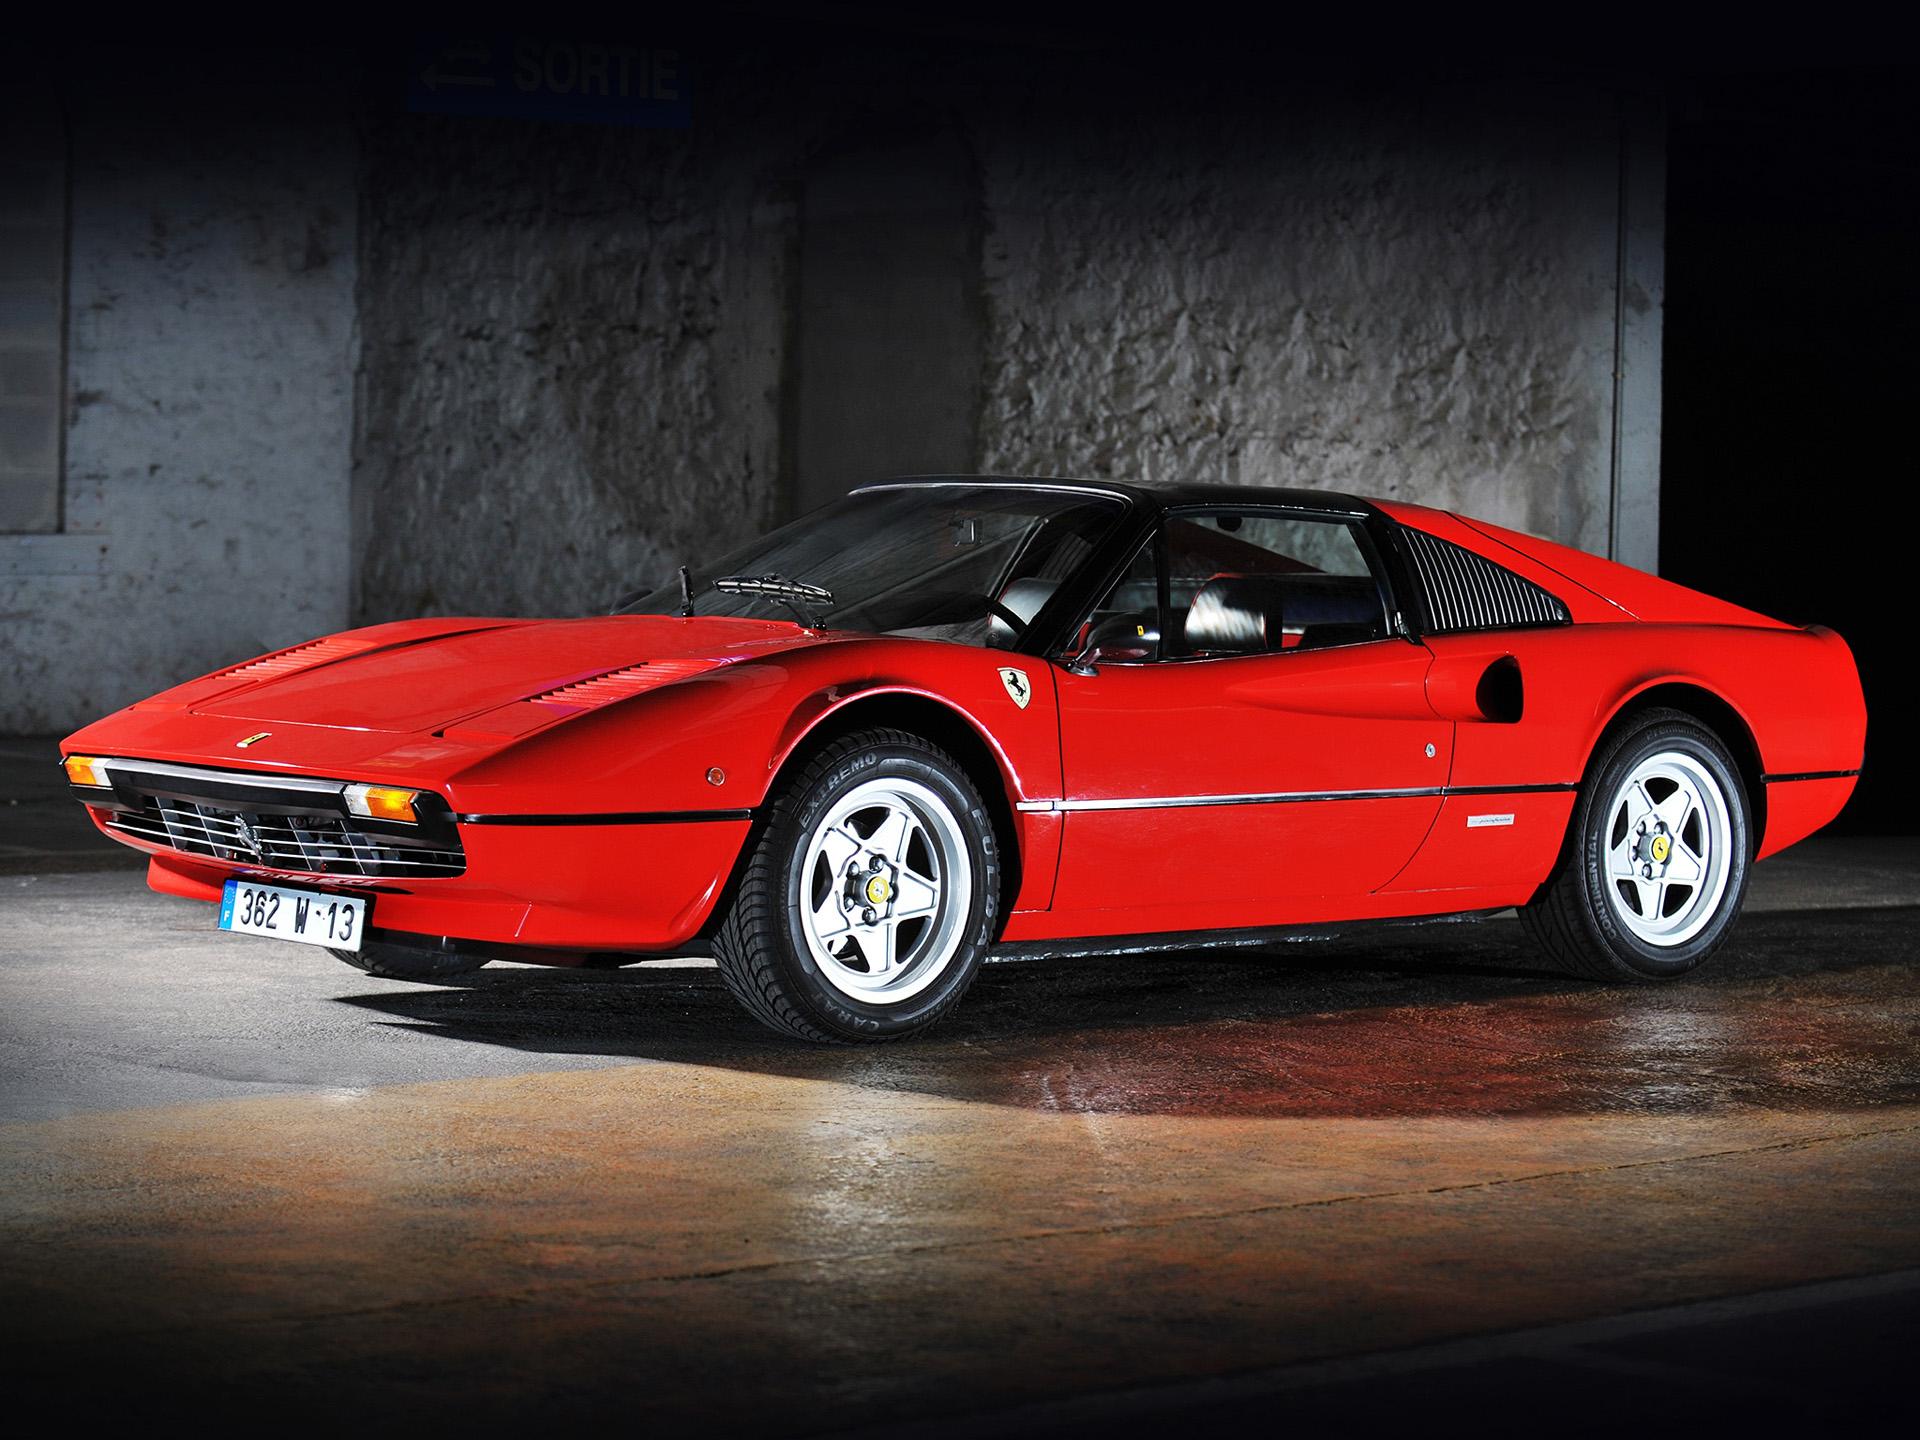 8 Ferrari 308 Gts Hd Wallpapers Backgrounds Wallpaper